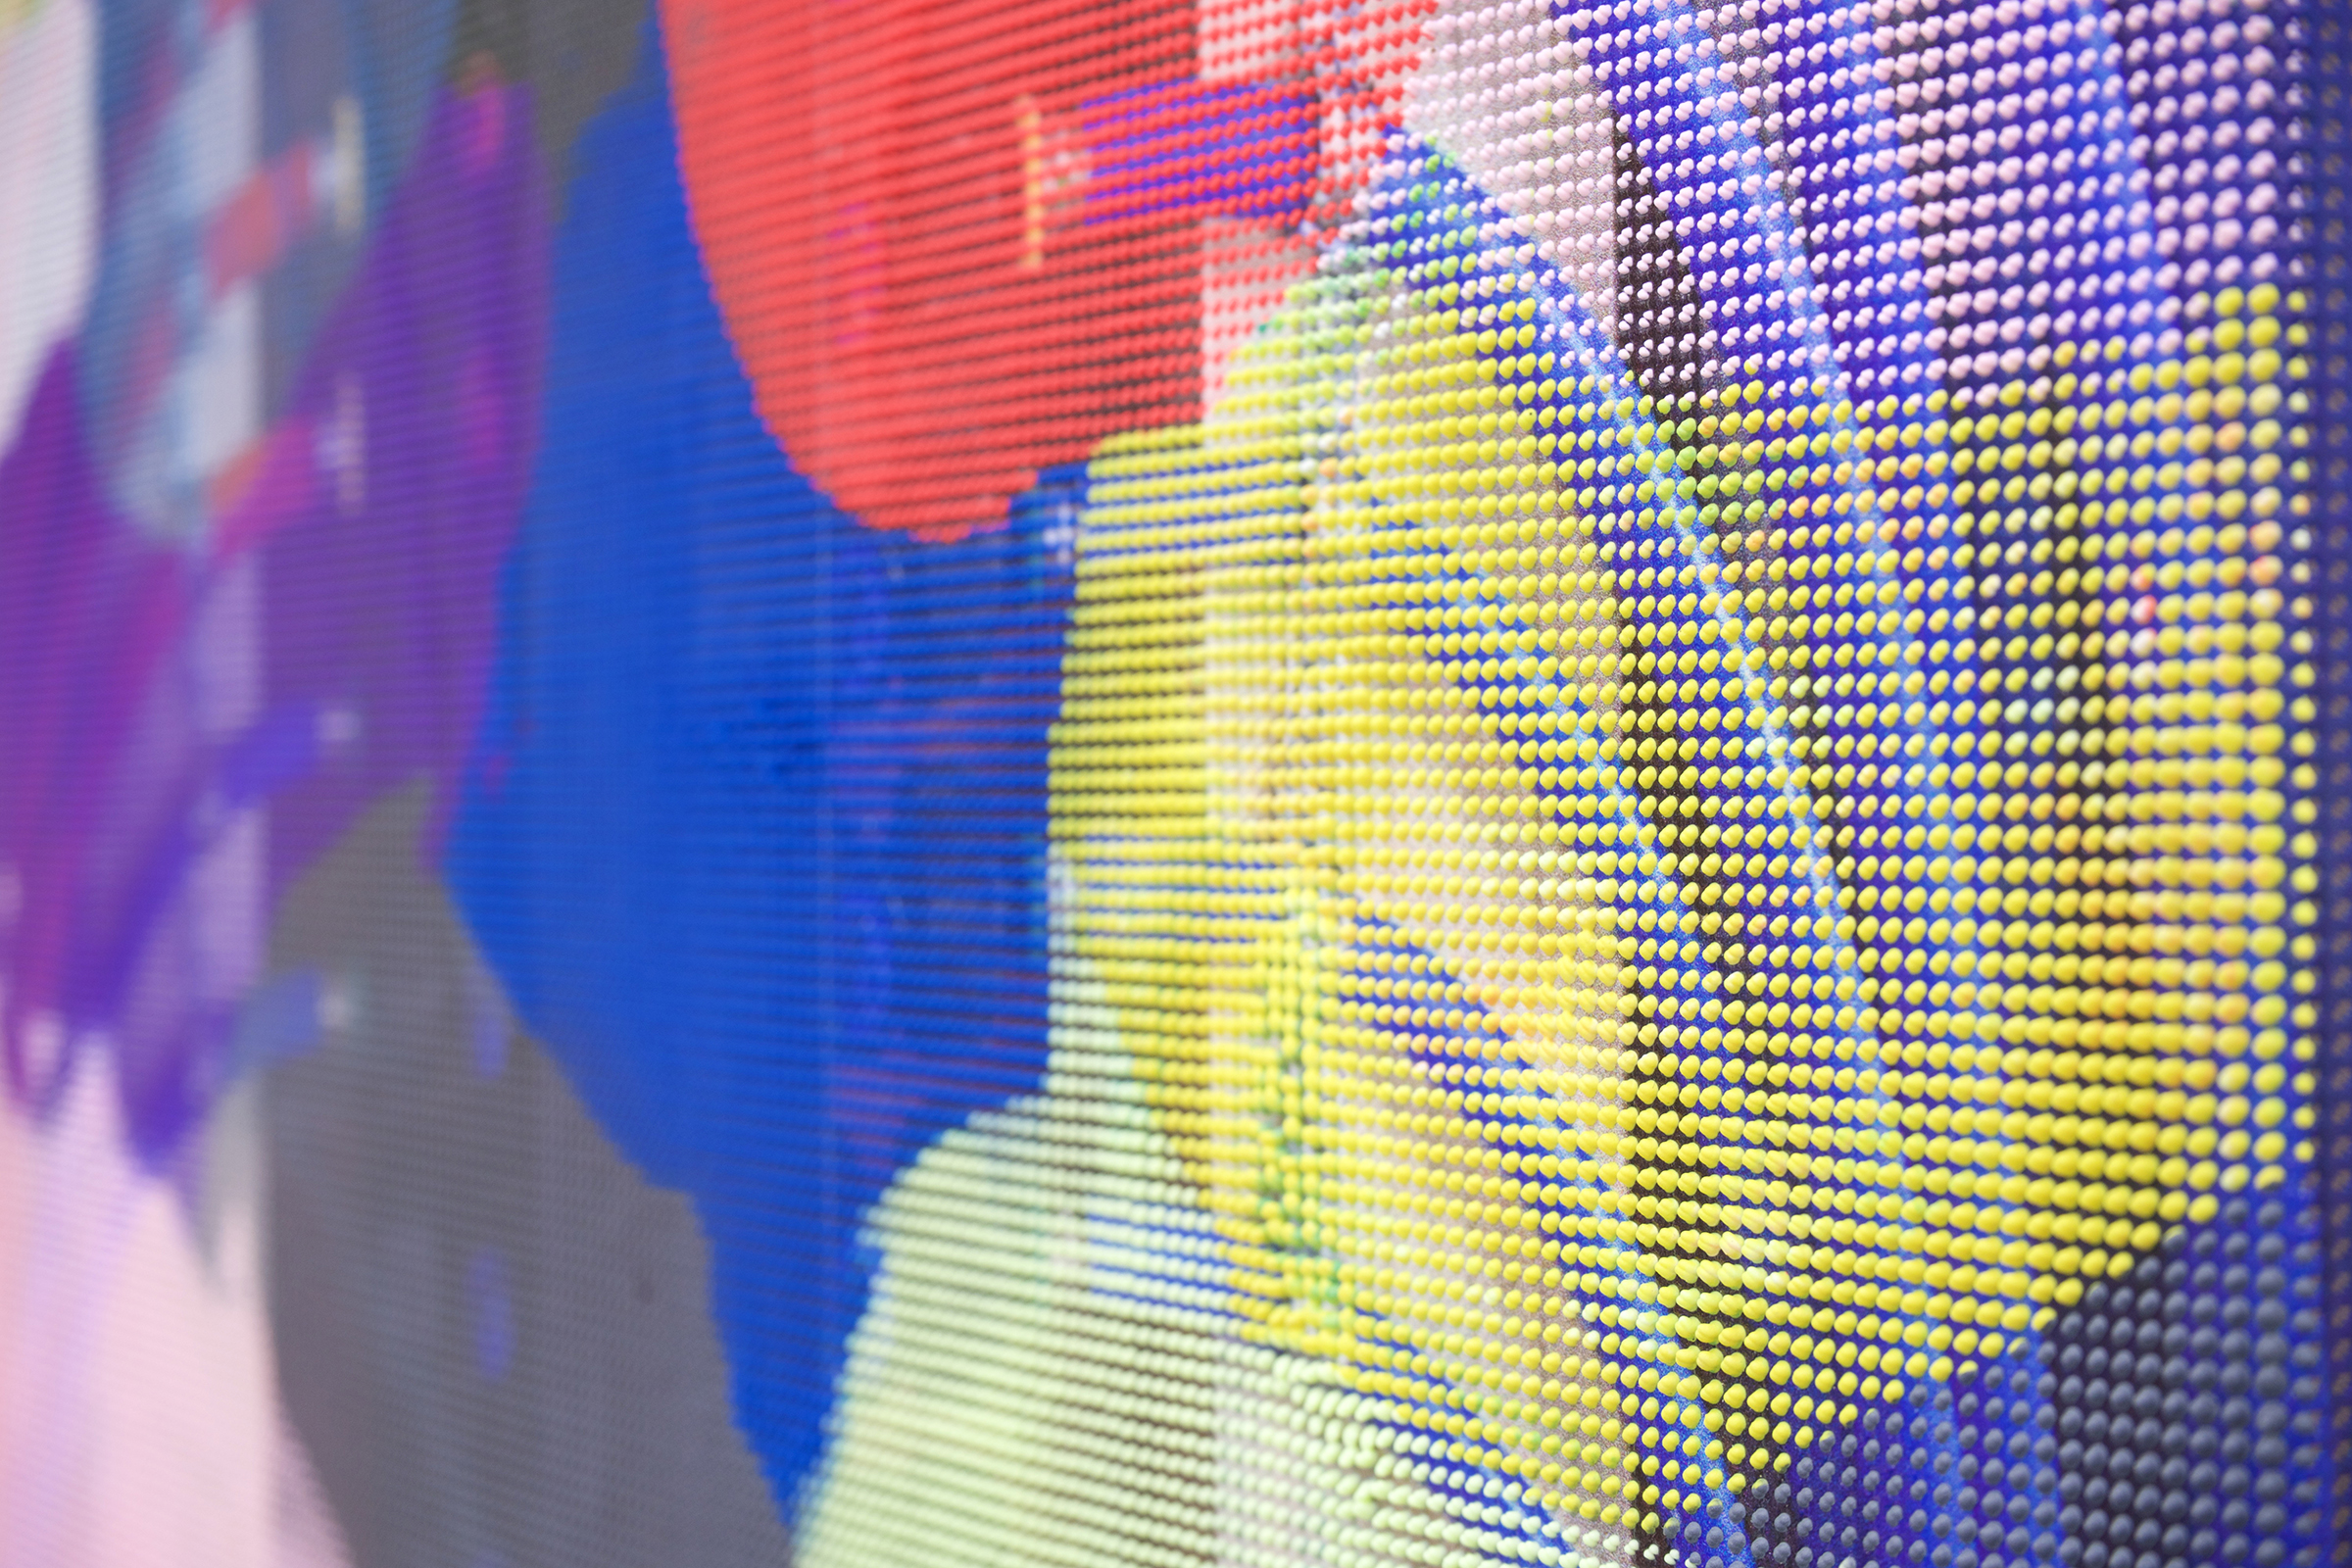 "EVAN NESBIT (detail)  Manifold Painting (Manifold #2) , 2017 acrylic, UV curable ink on vinyl coated mesh fabric, 30"" x 18"""